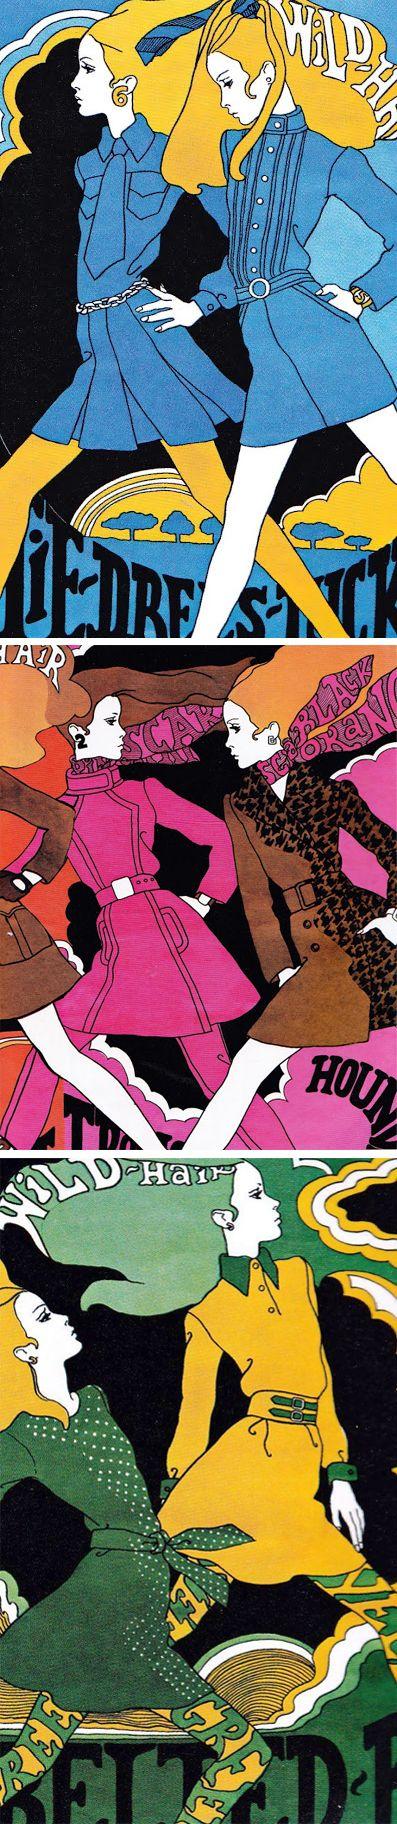 Illustrations by Antonio Lopez, originally for Intro Magazine 1967